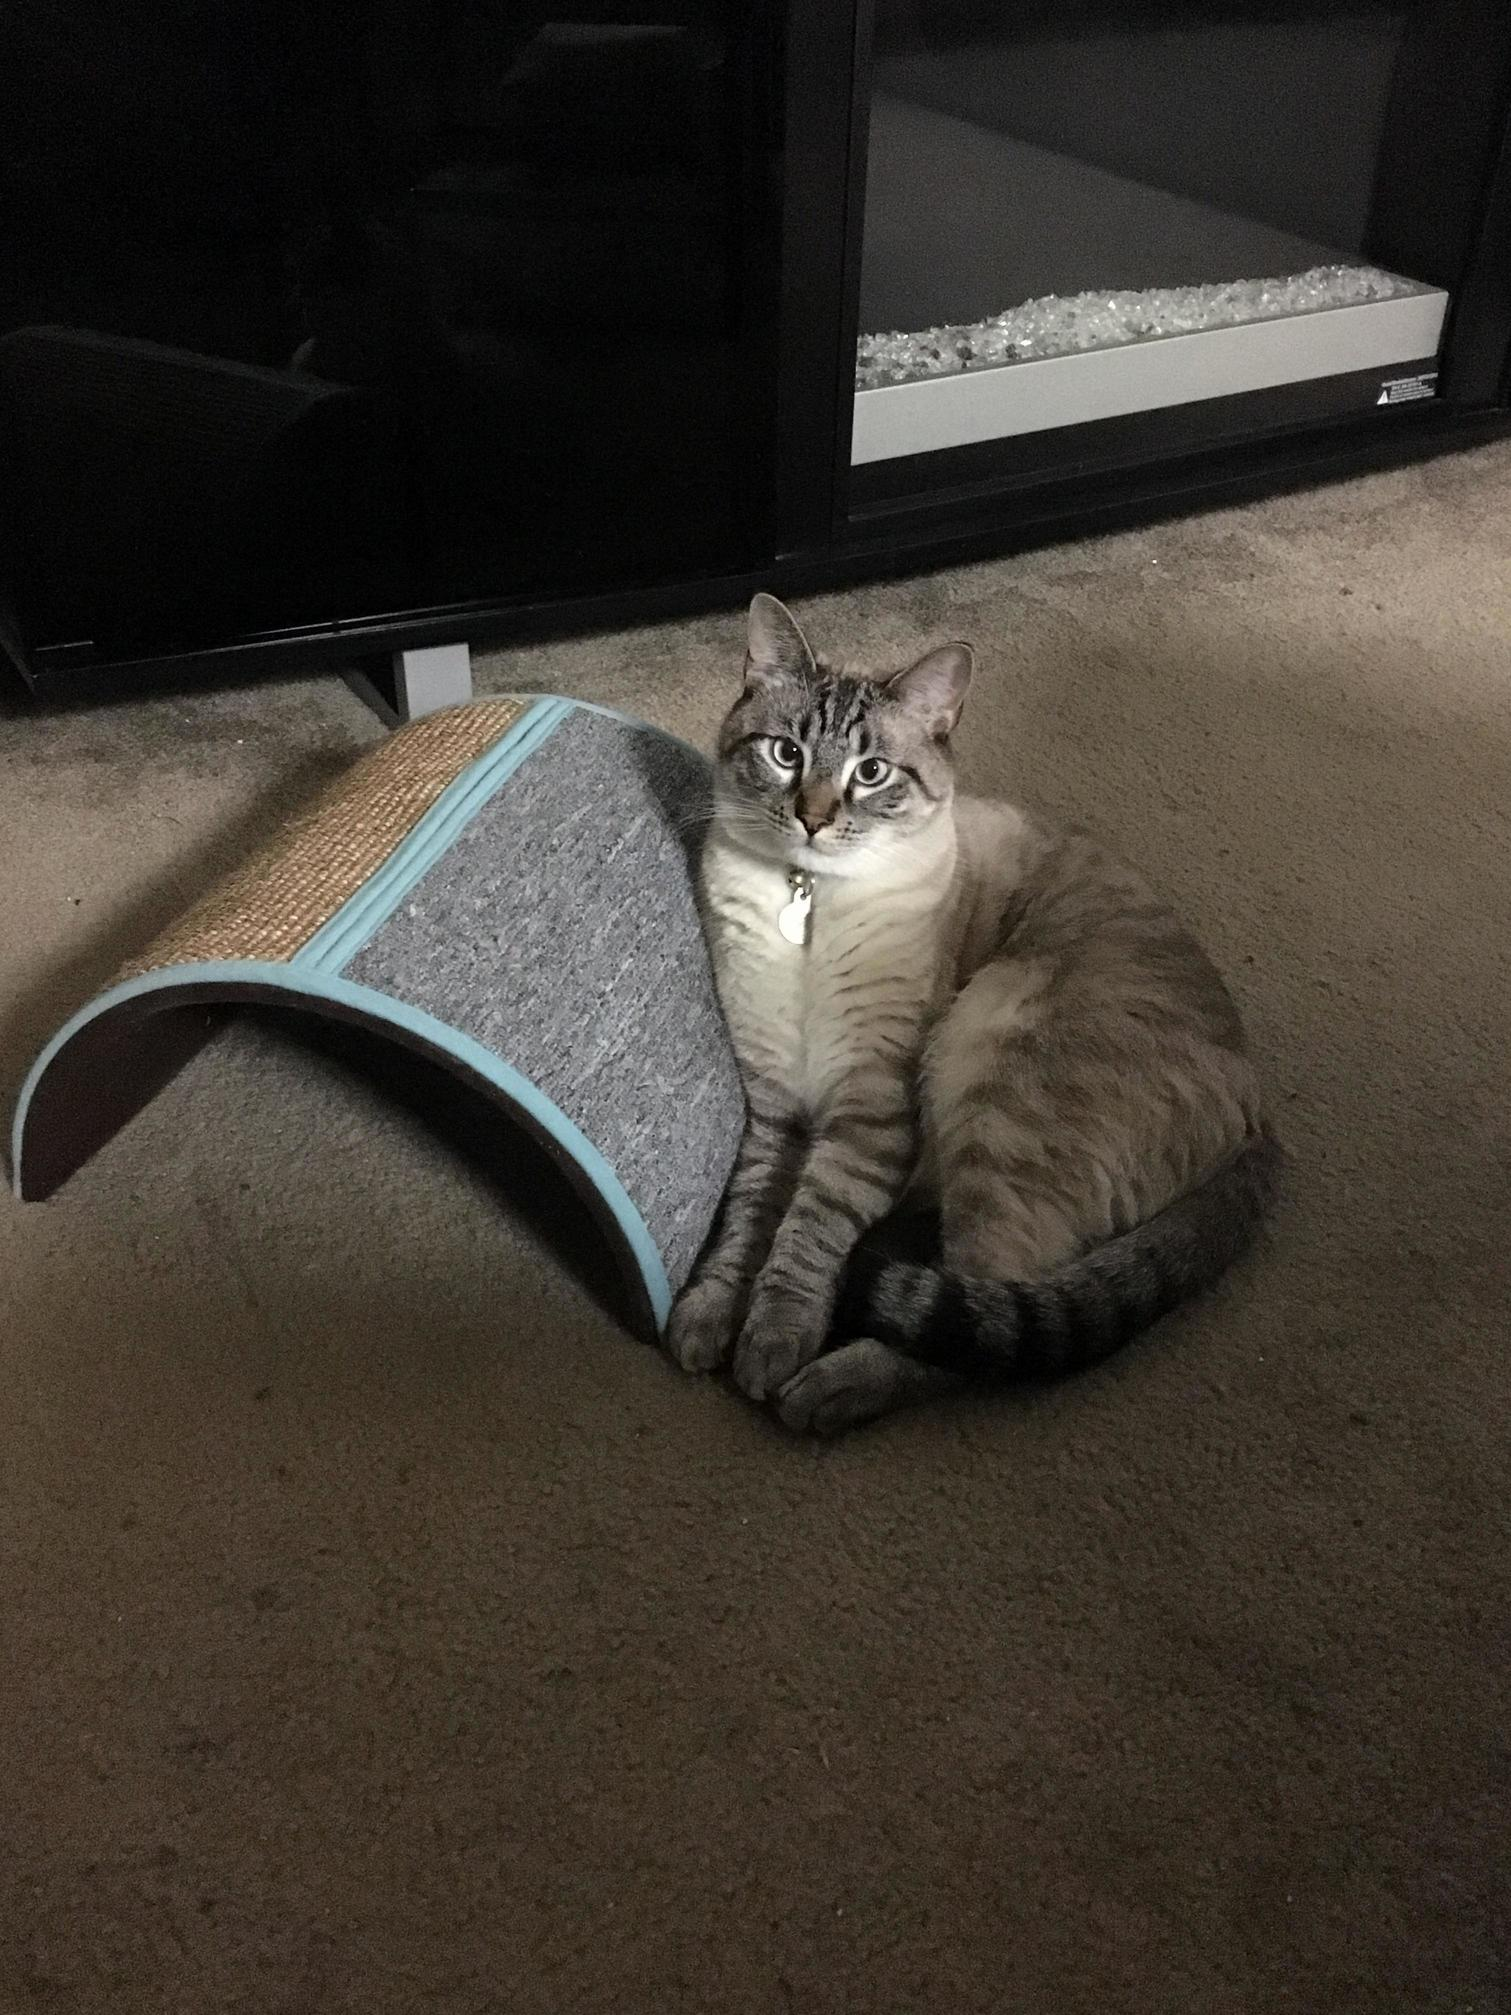 Dark Cat With White Tail Deck